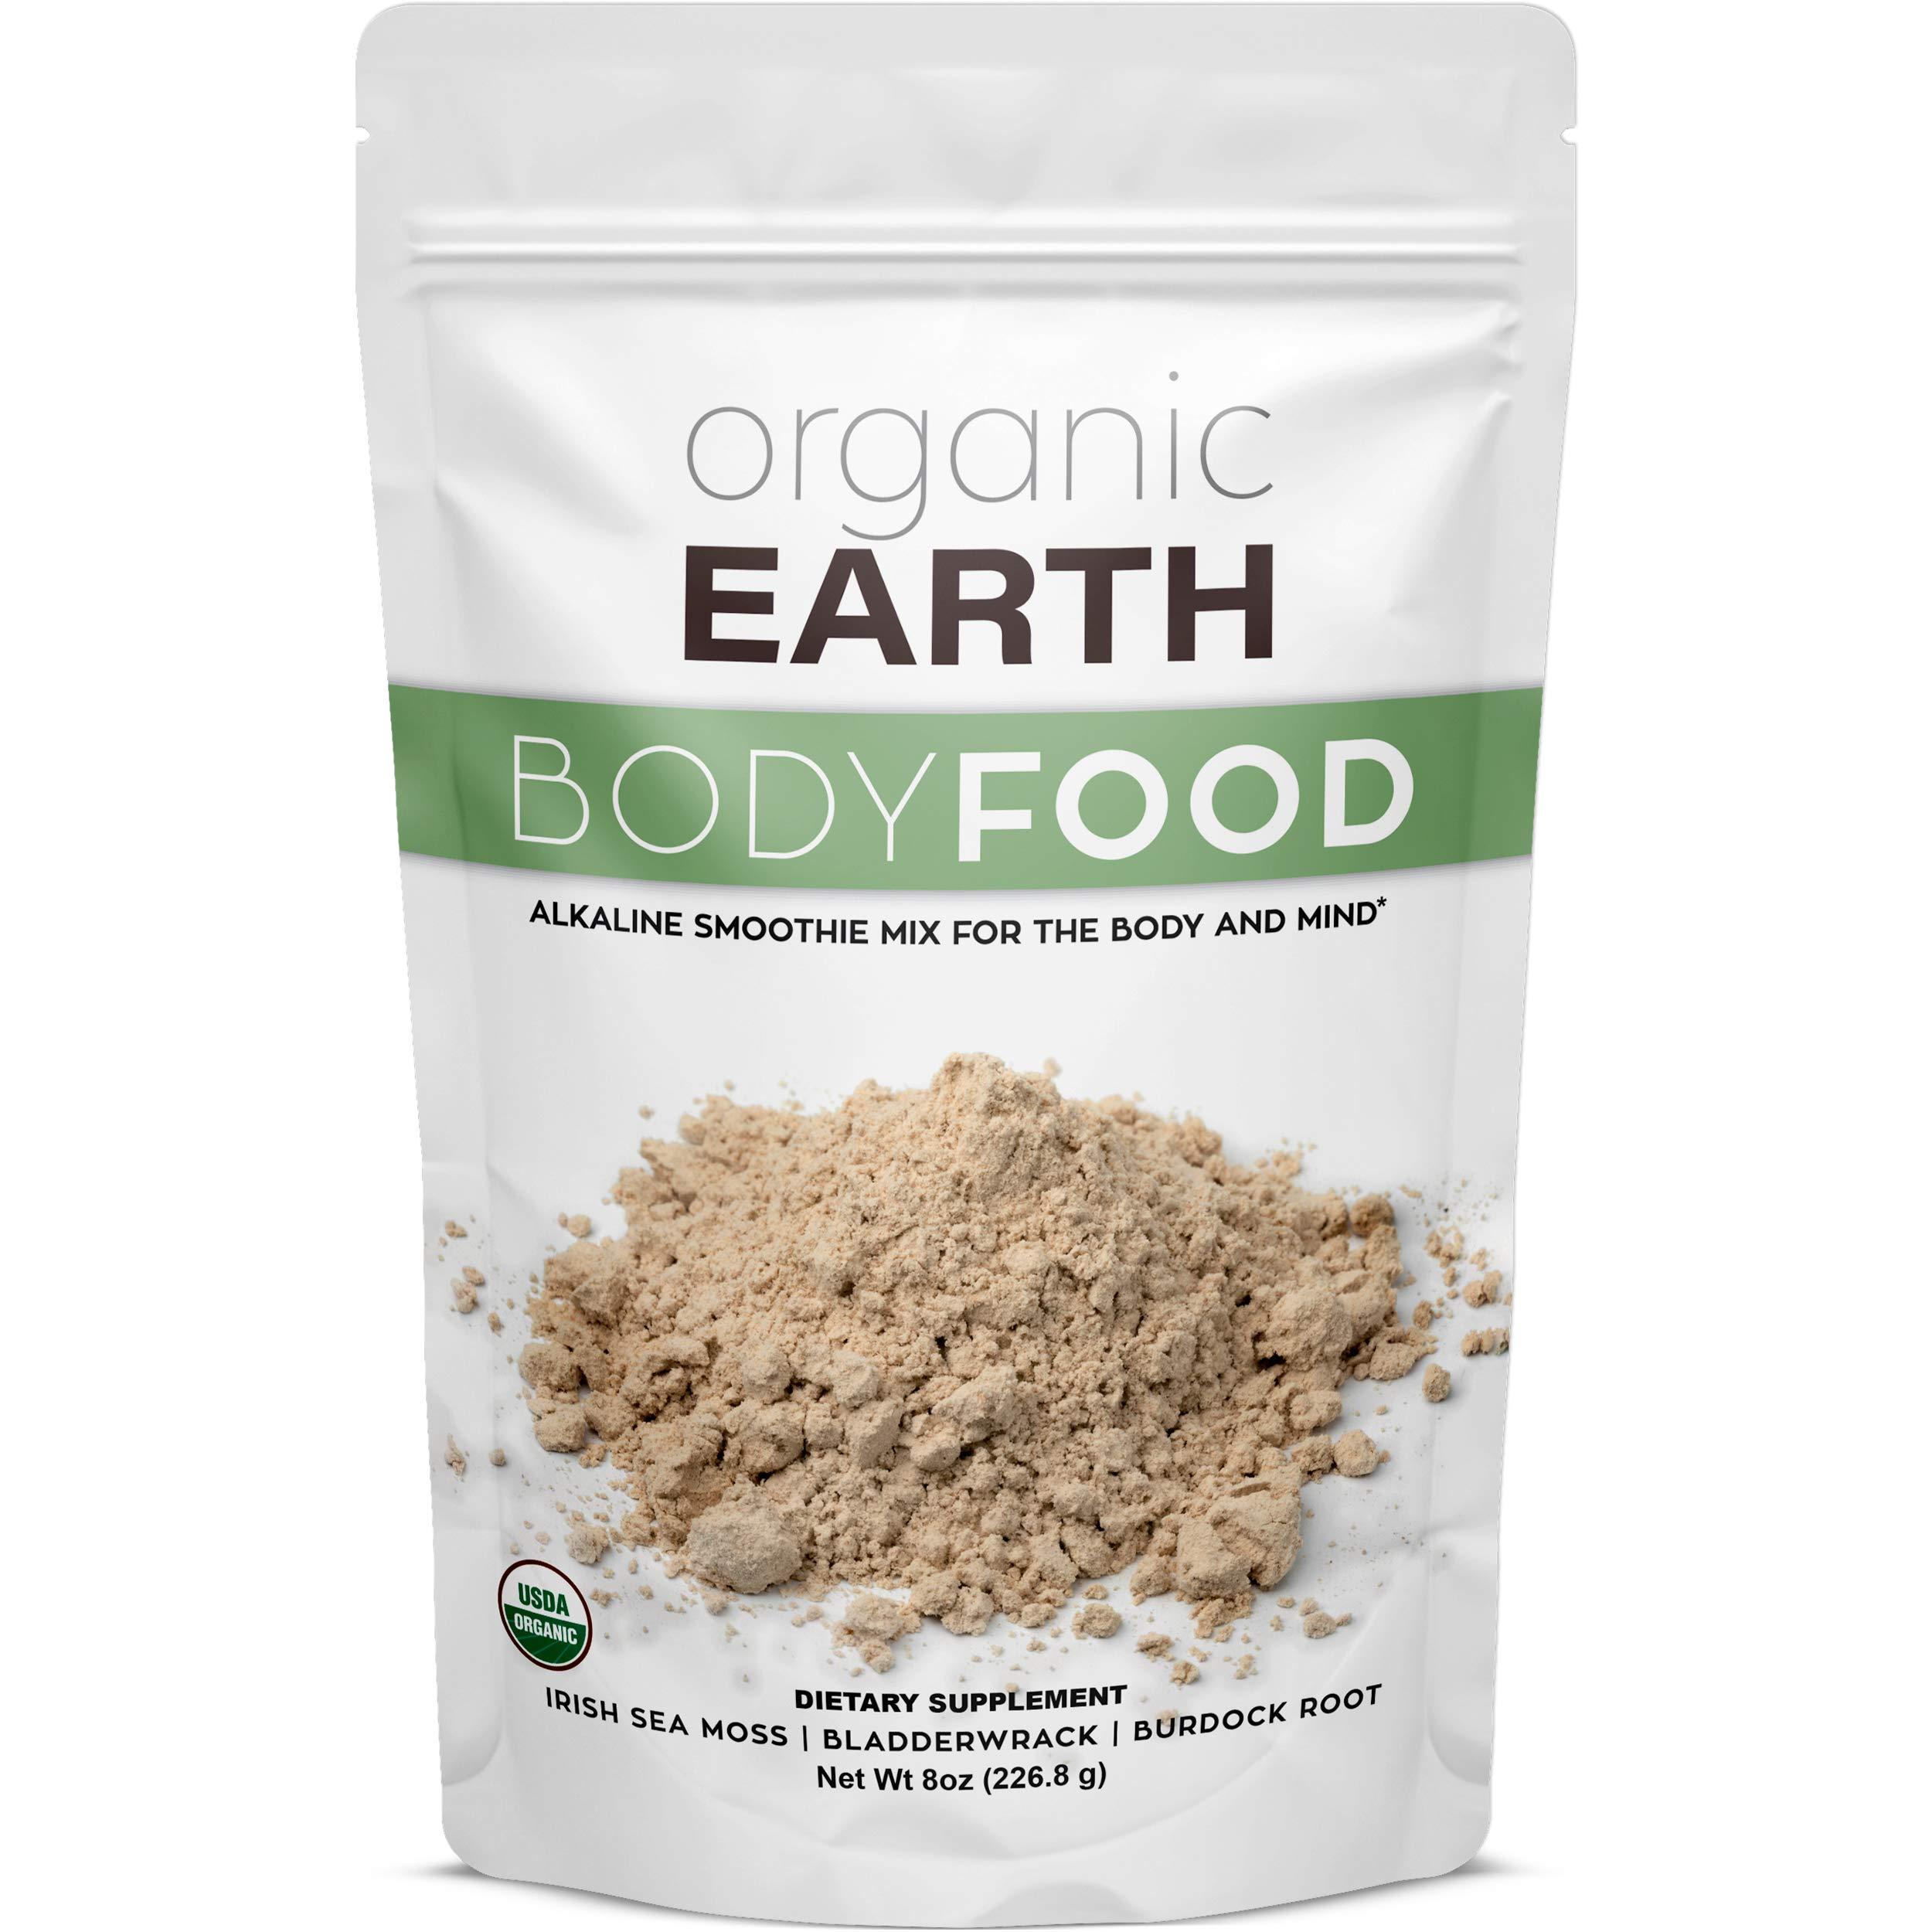 Organic Earth Irish Sea Moss Powder (8 Ounces) Super Cell Body Food - Wildcrafted Irish Sea Moss Bladderwrack Plus Burdock Root Powder - Natural Irish Moss Seaweed - USDA Certified Organic